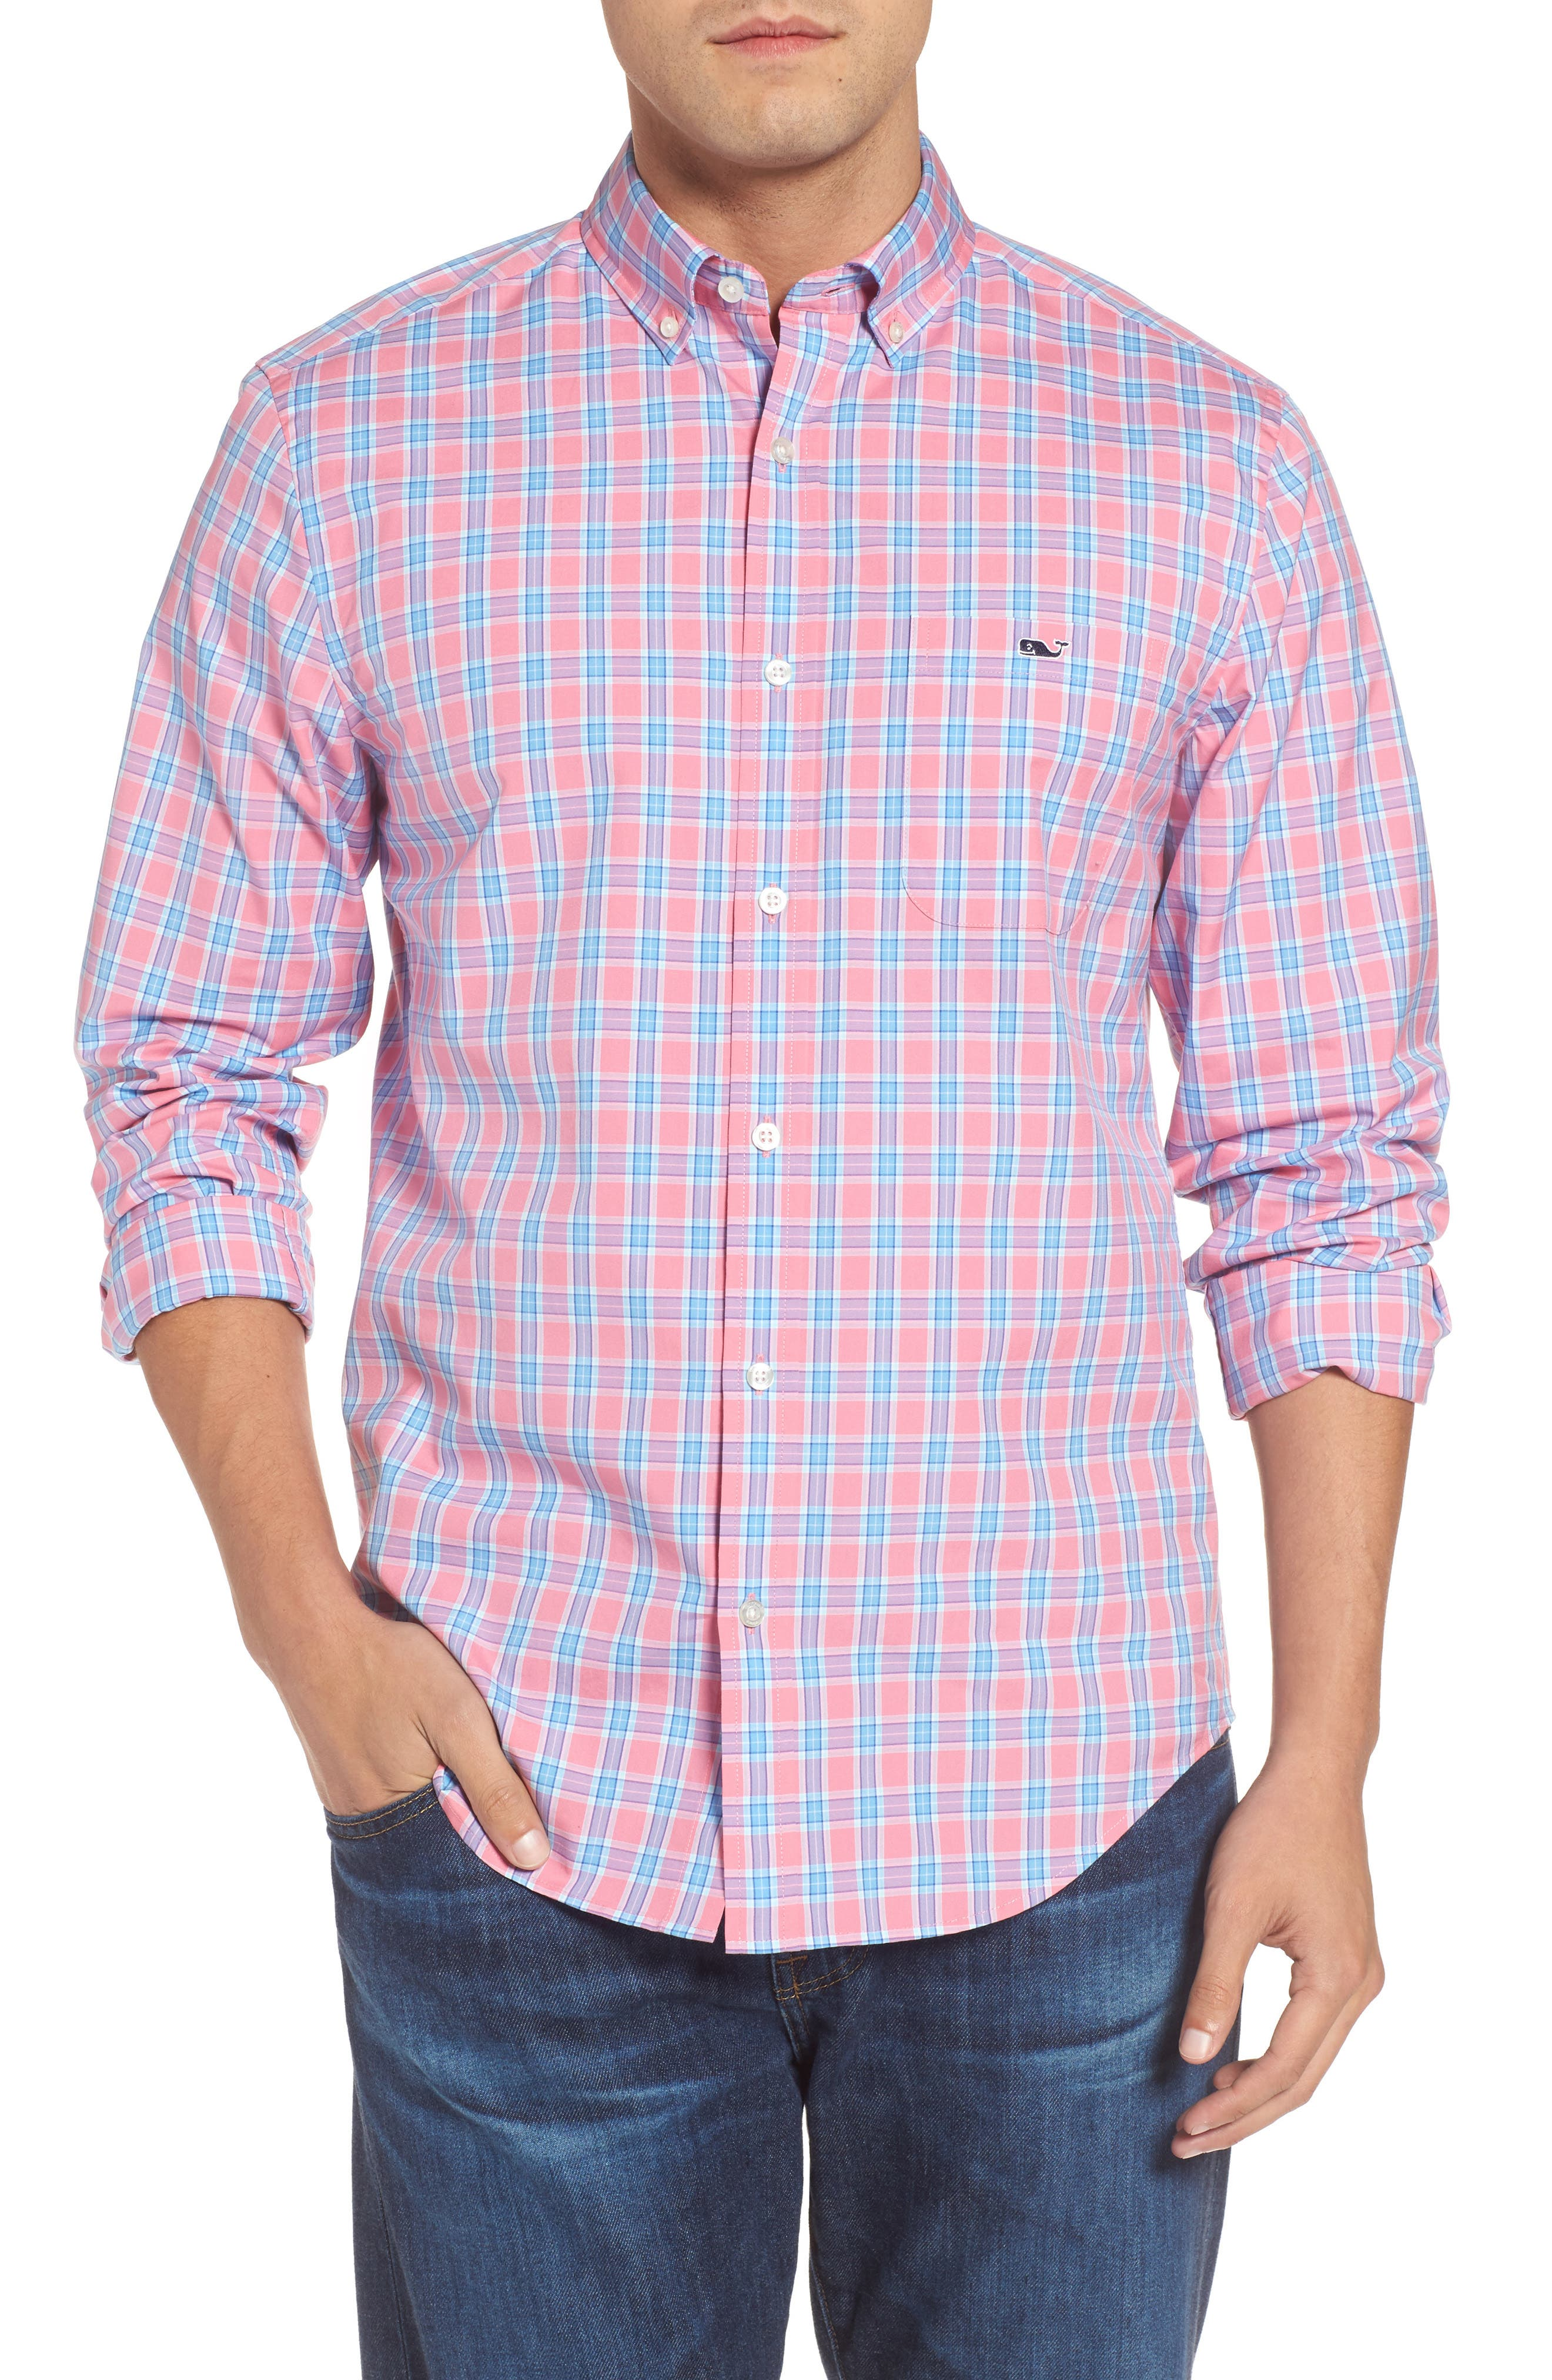 Main Image - vineyard vines Tucker Bayard Classic Fit Plaid Sport Shirt